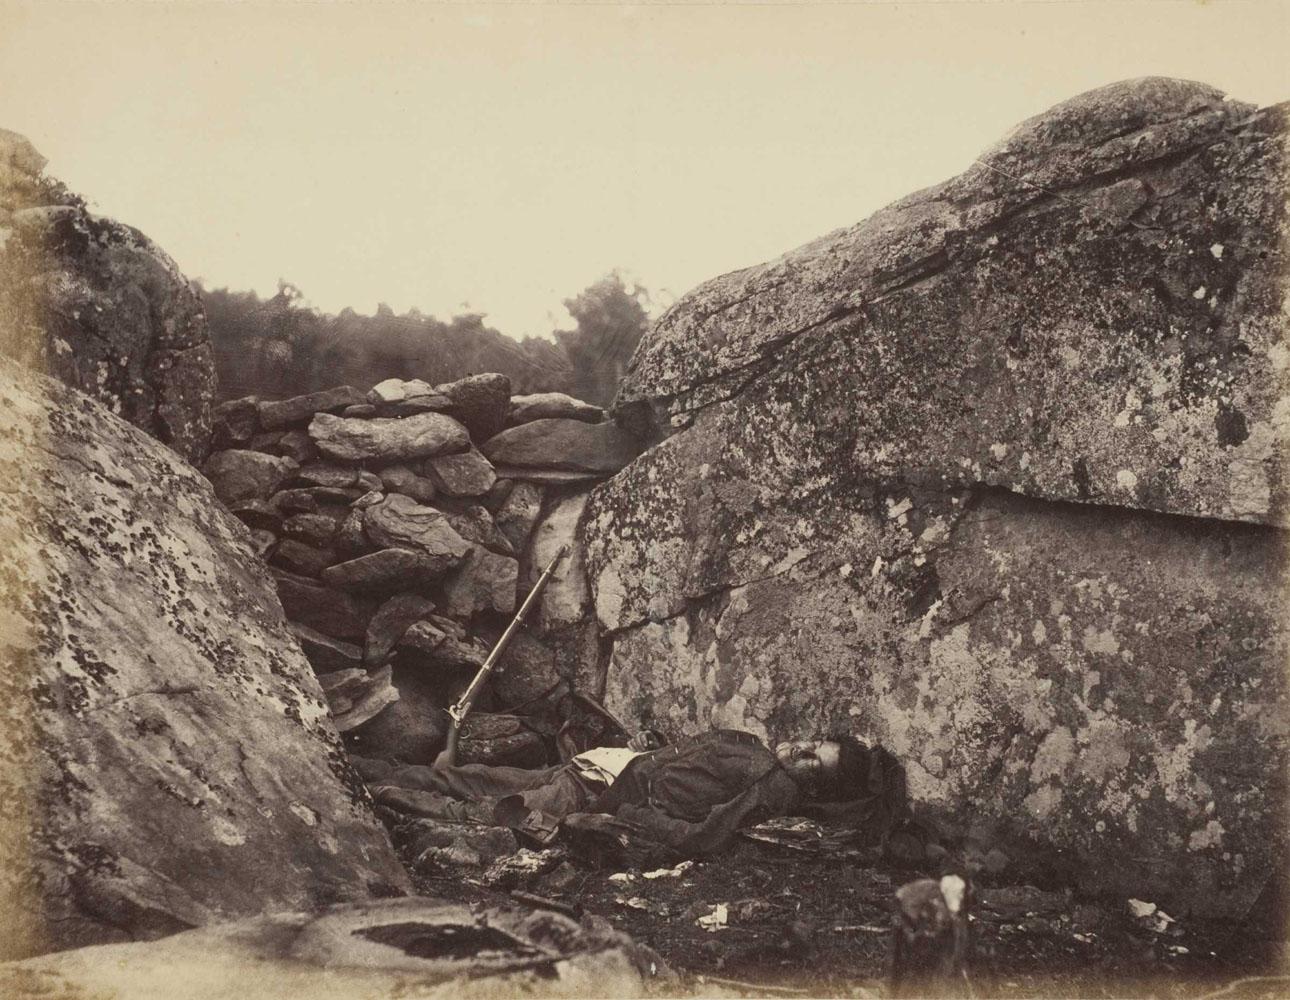 The Home of a Rebel Sharpshooter, Gettysburg, Pennsylvania,                                Plate 41, Vol. 1, Gardner's Photographic Sketch Book of the War                               1863                               Alexander Gardner, American, born Scotland, 1821–1882